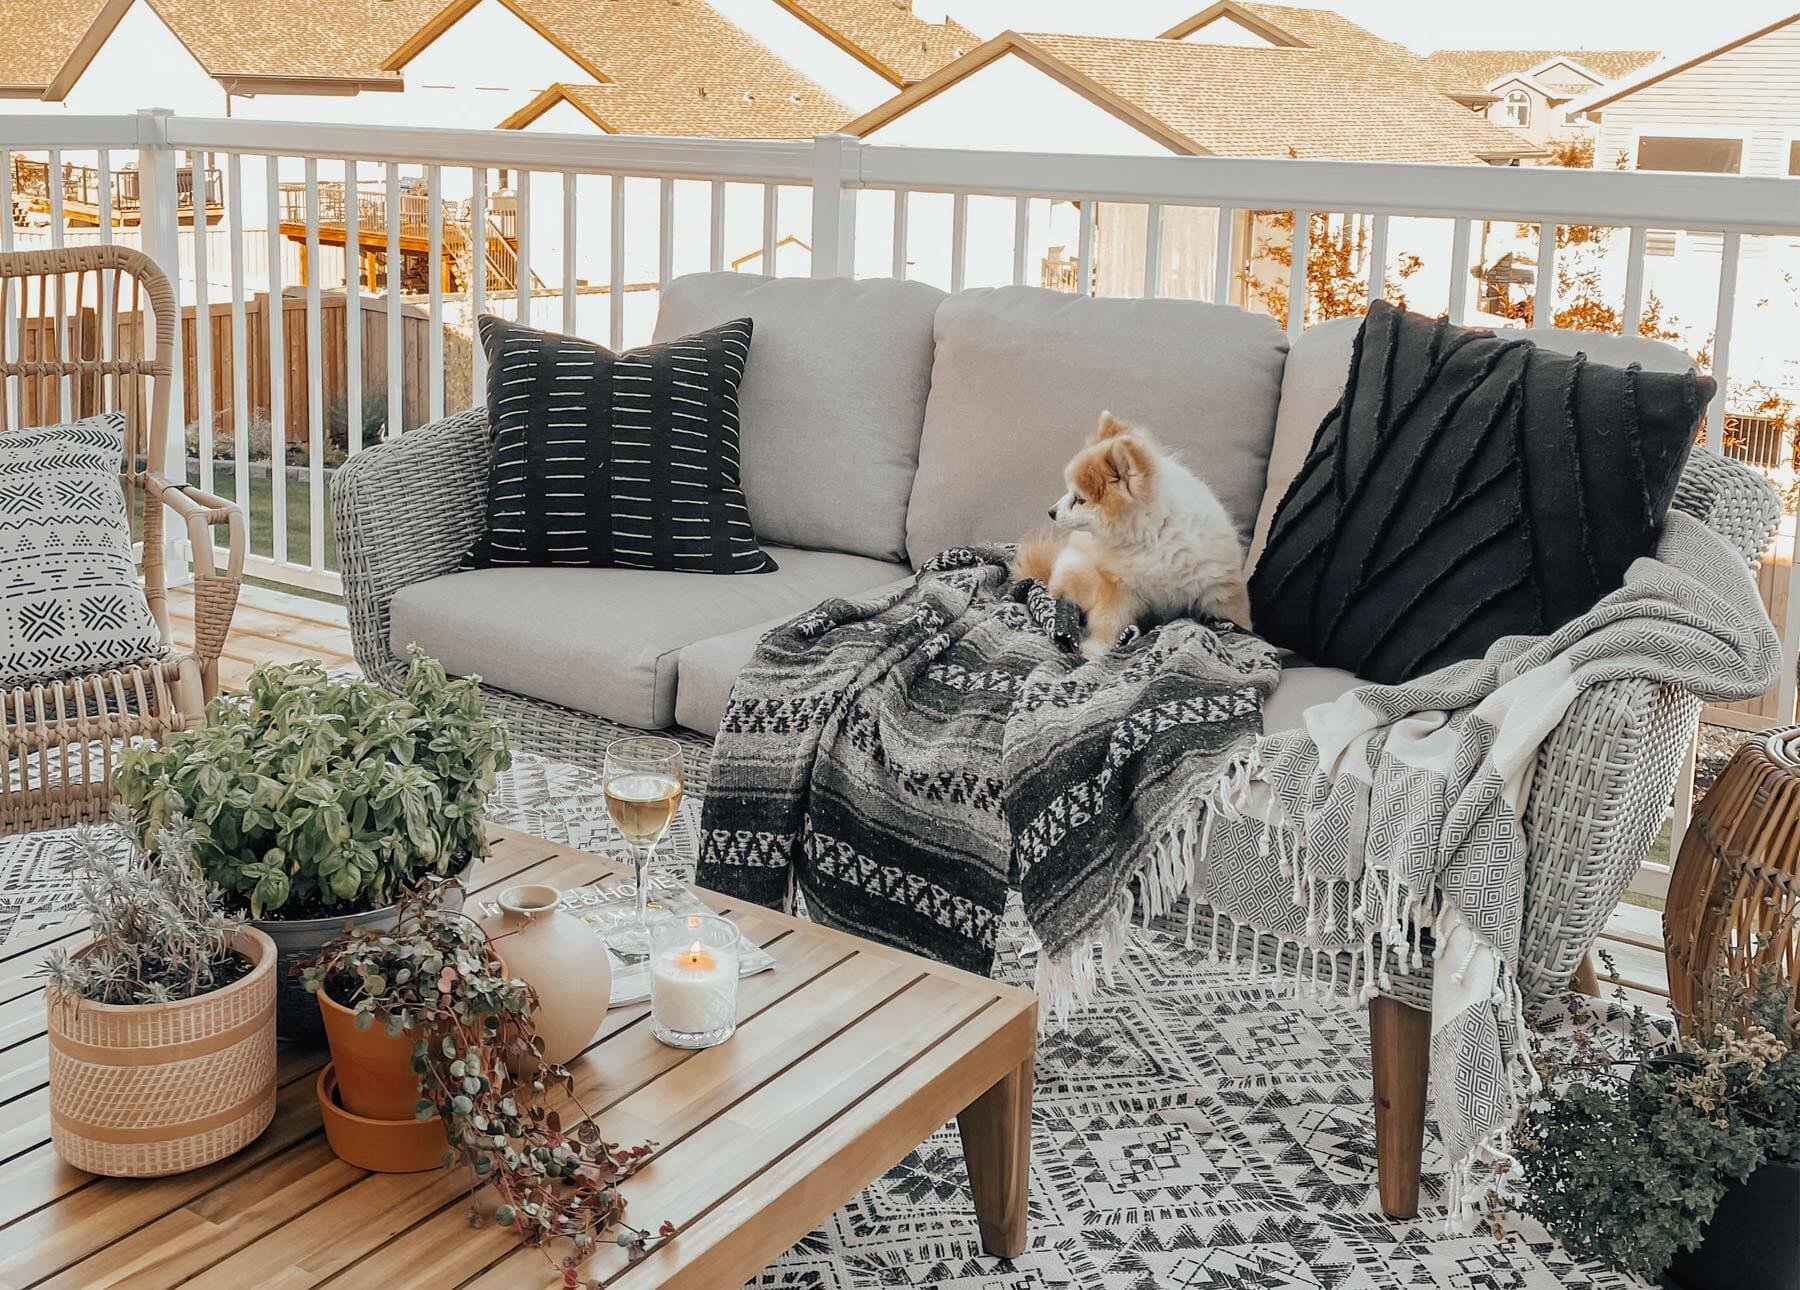 The Blush Home's sweet pup enjoys some patio time on their Ora Sofa.